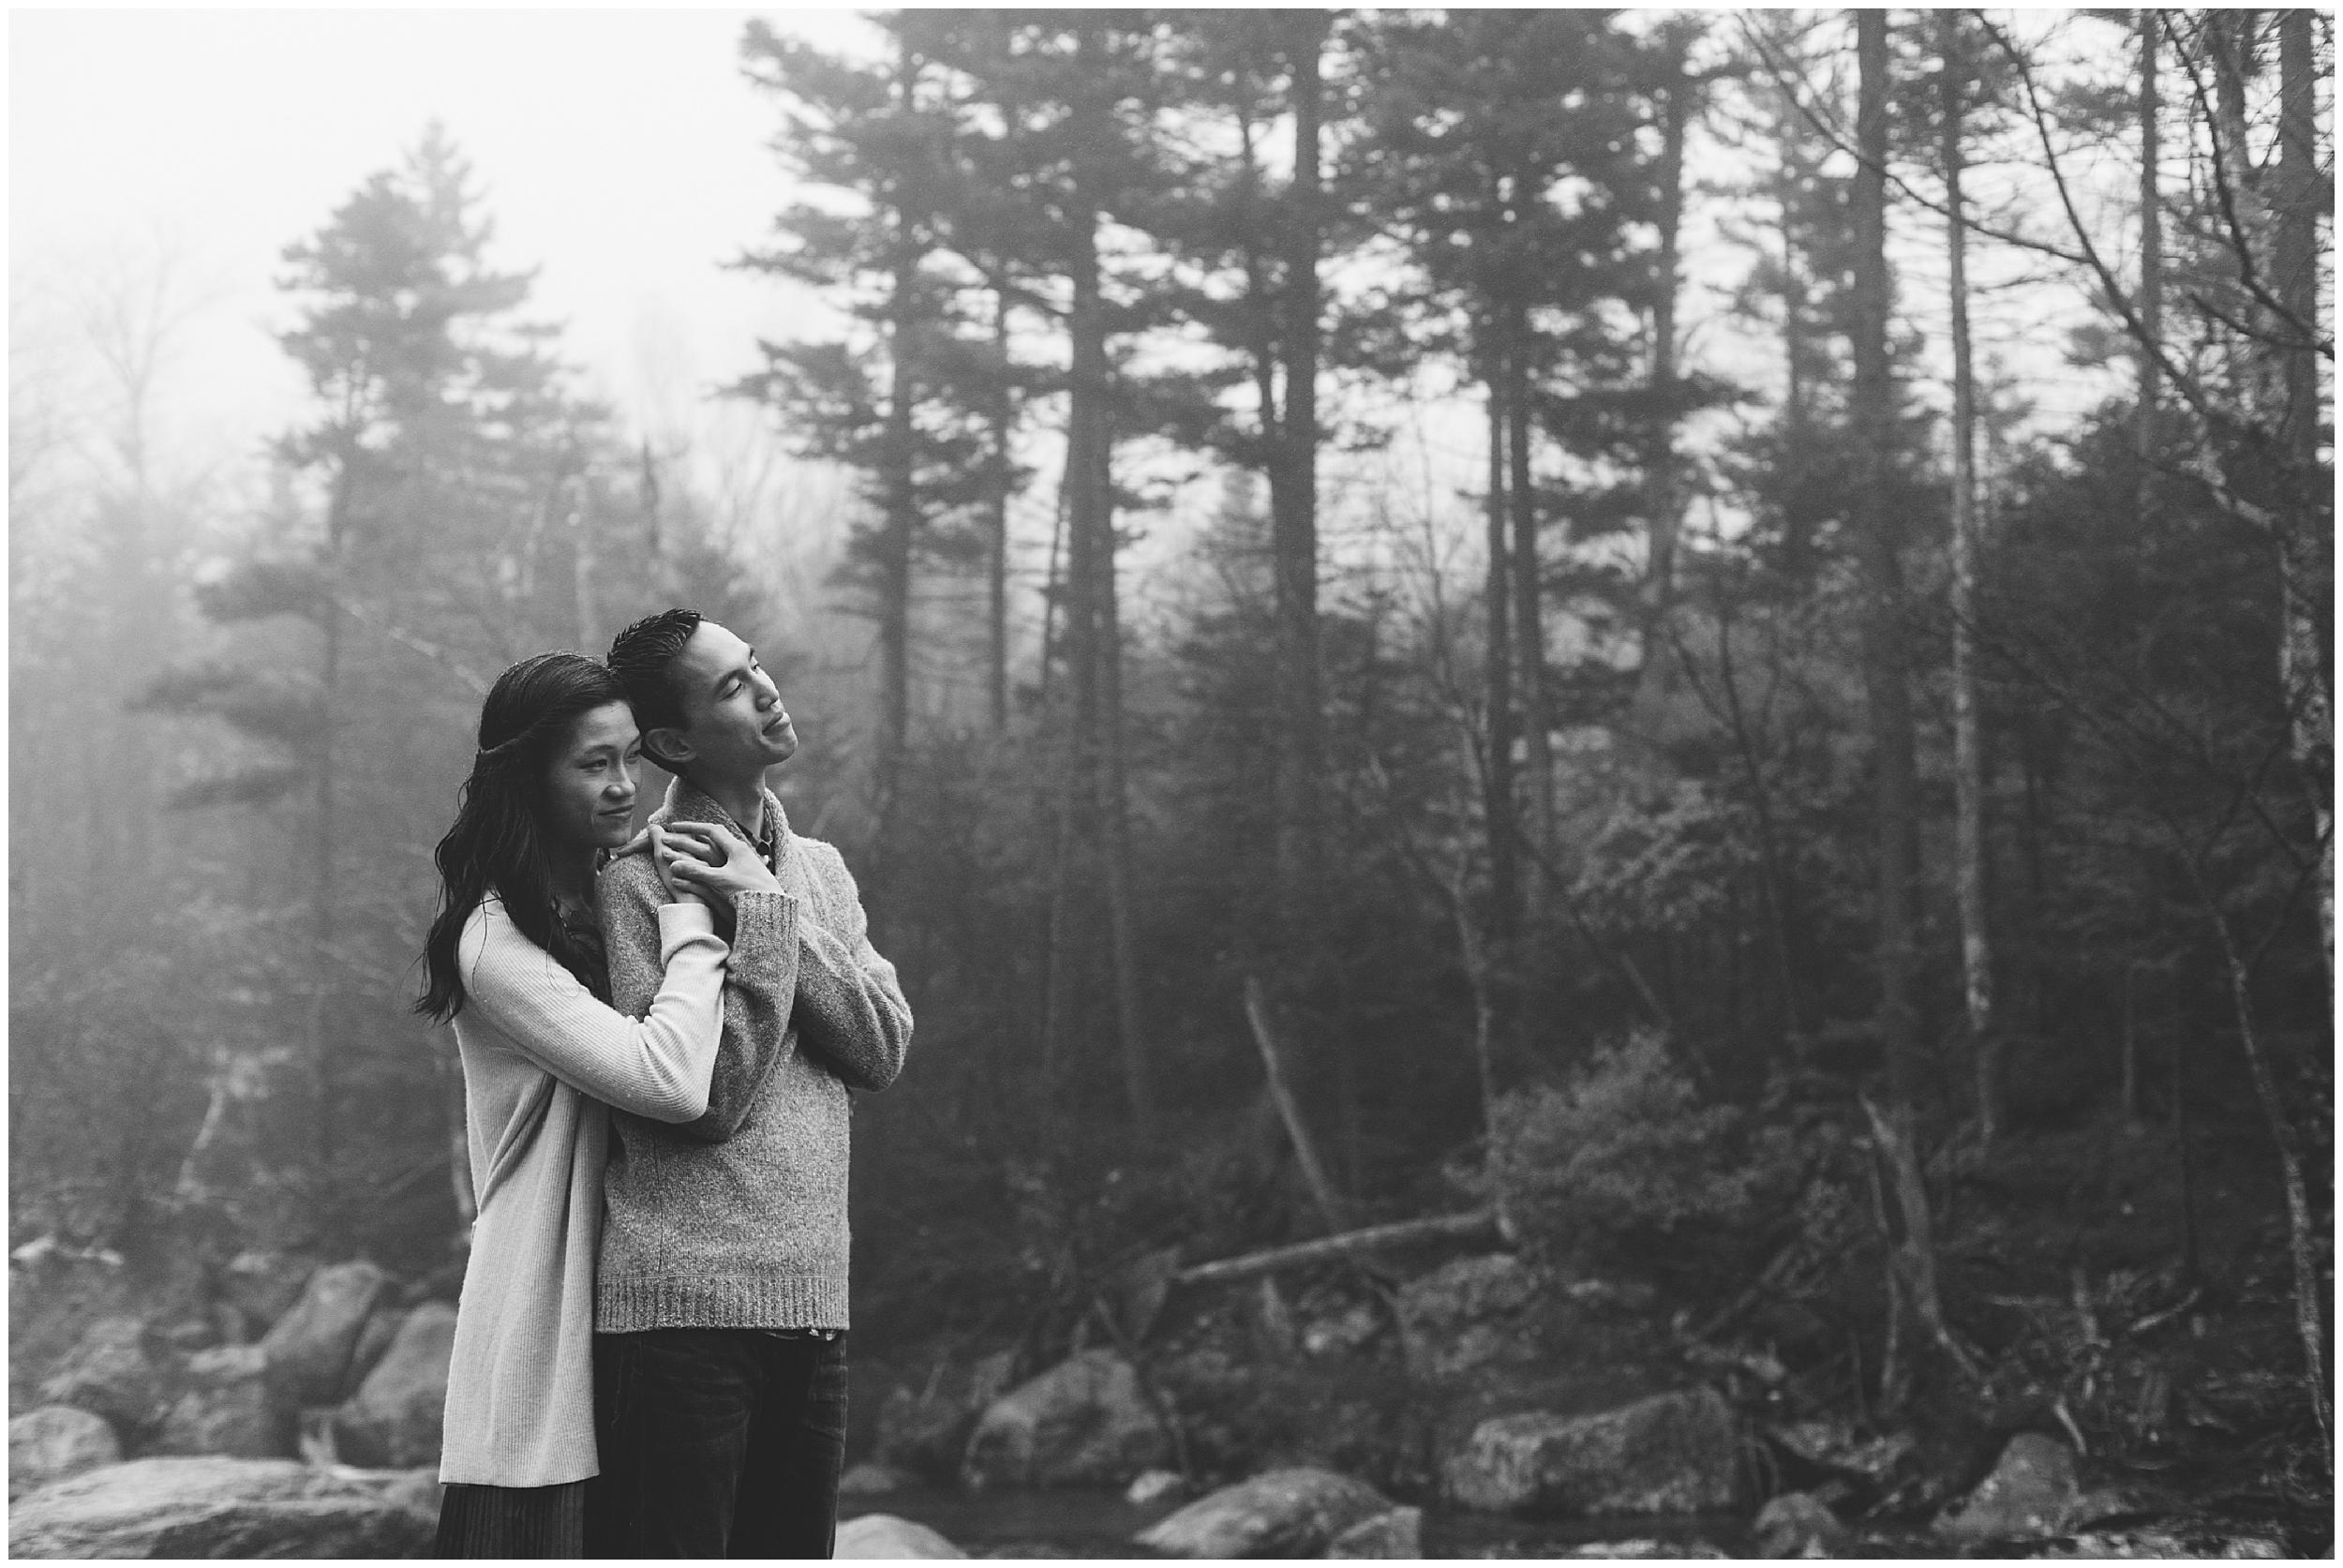 White-Mountains-Engagement-Bailey-Q-Photo-New-Hampshire-Wedding-Photographer-06.jpg